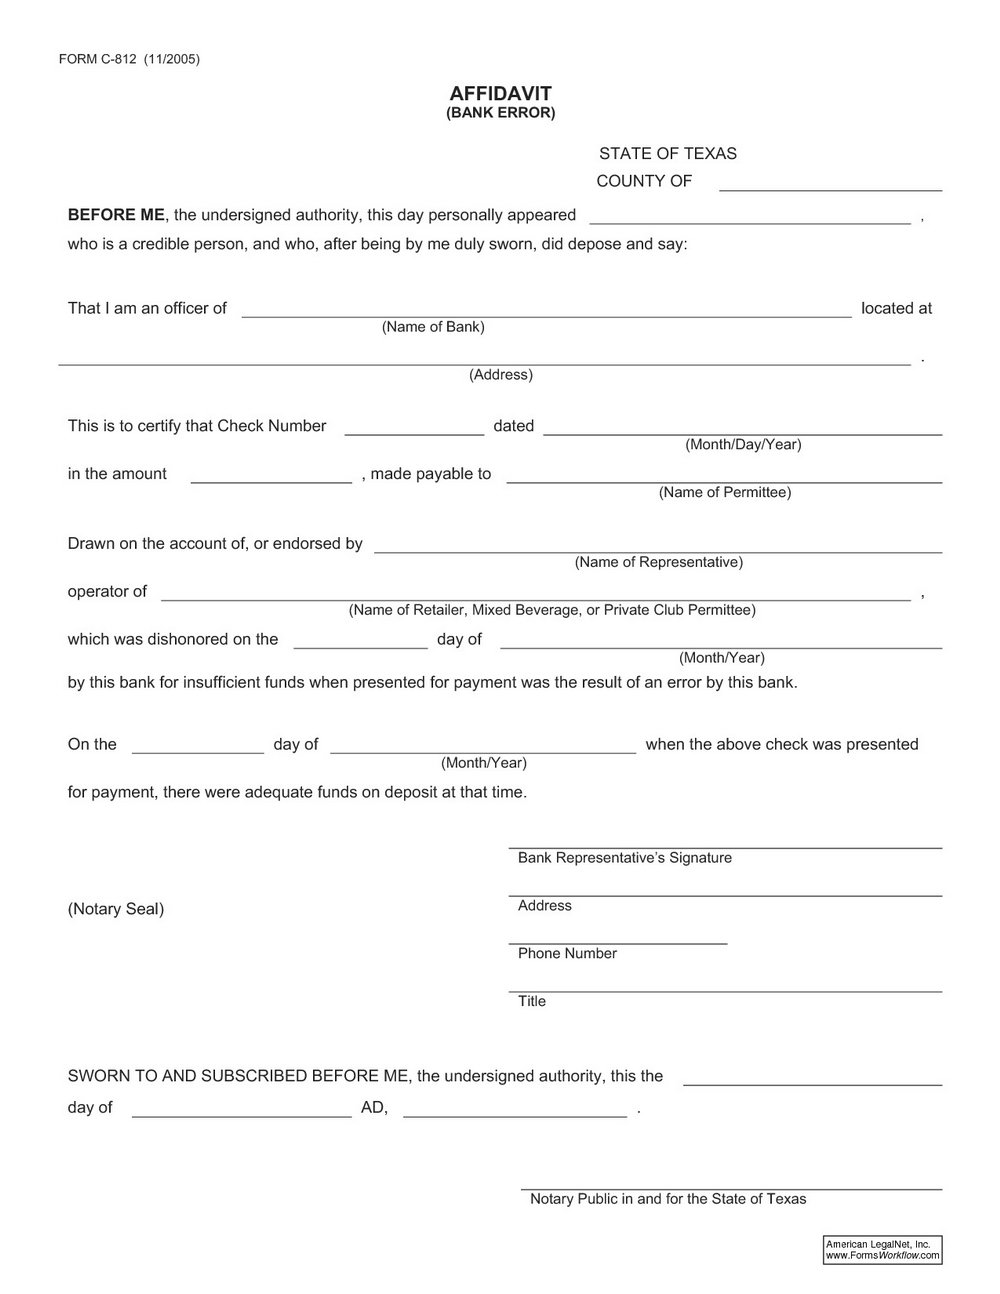 Texas Notary Affidavit Form